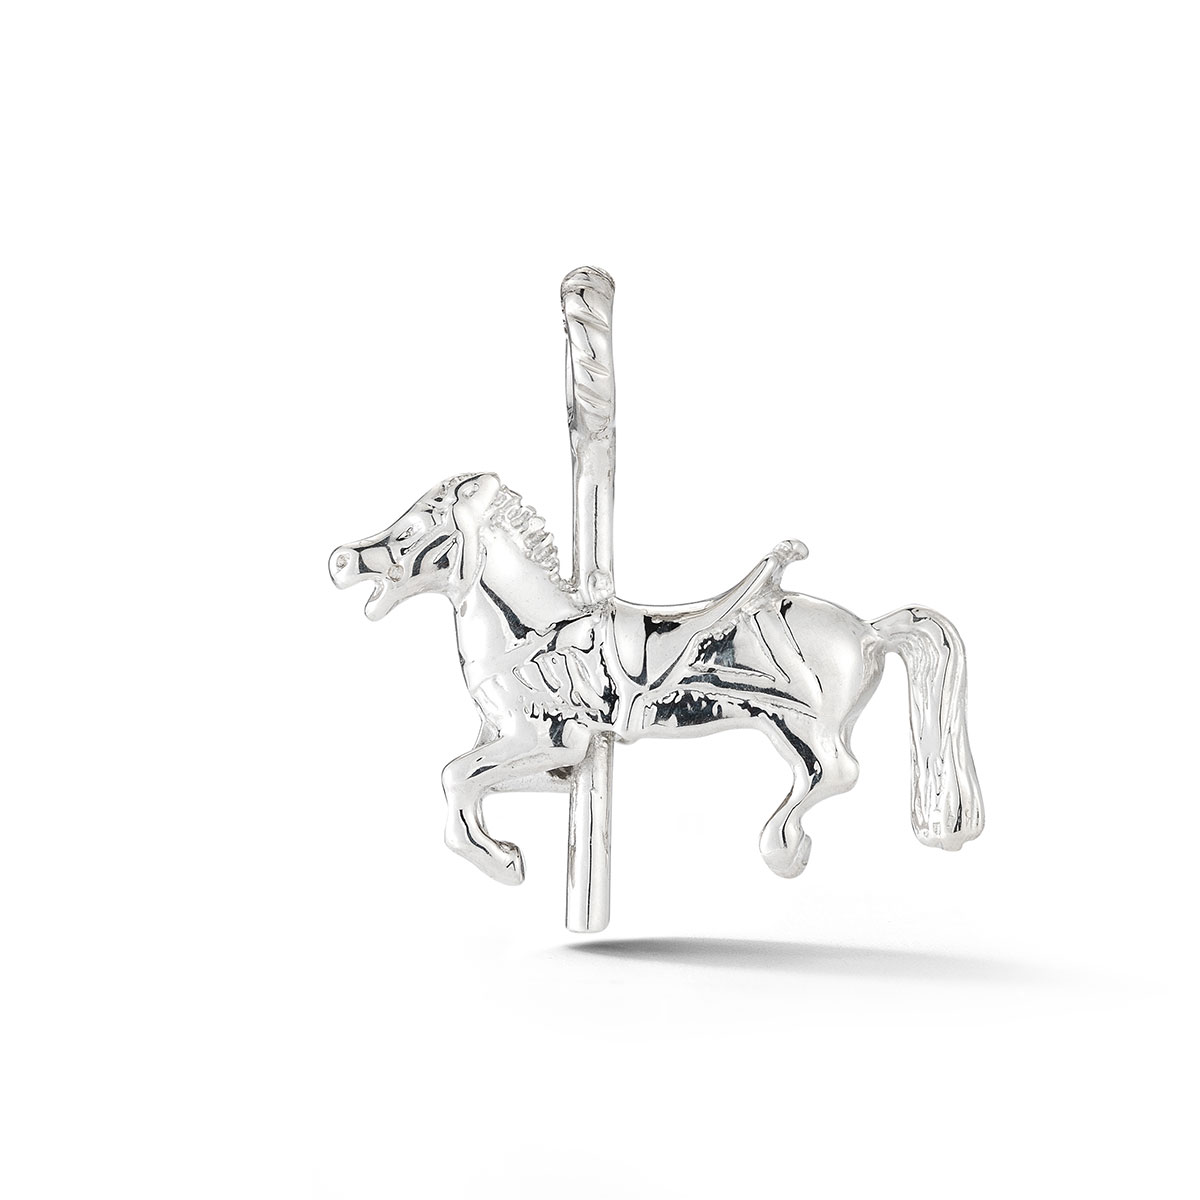 DJCHCHSM Carousel Horse Charm